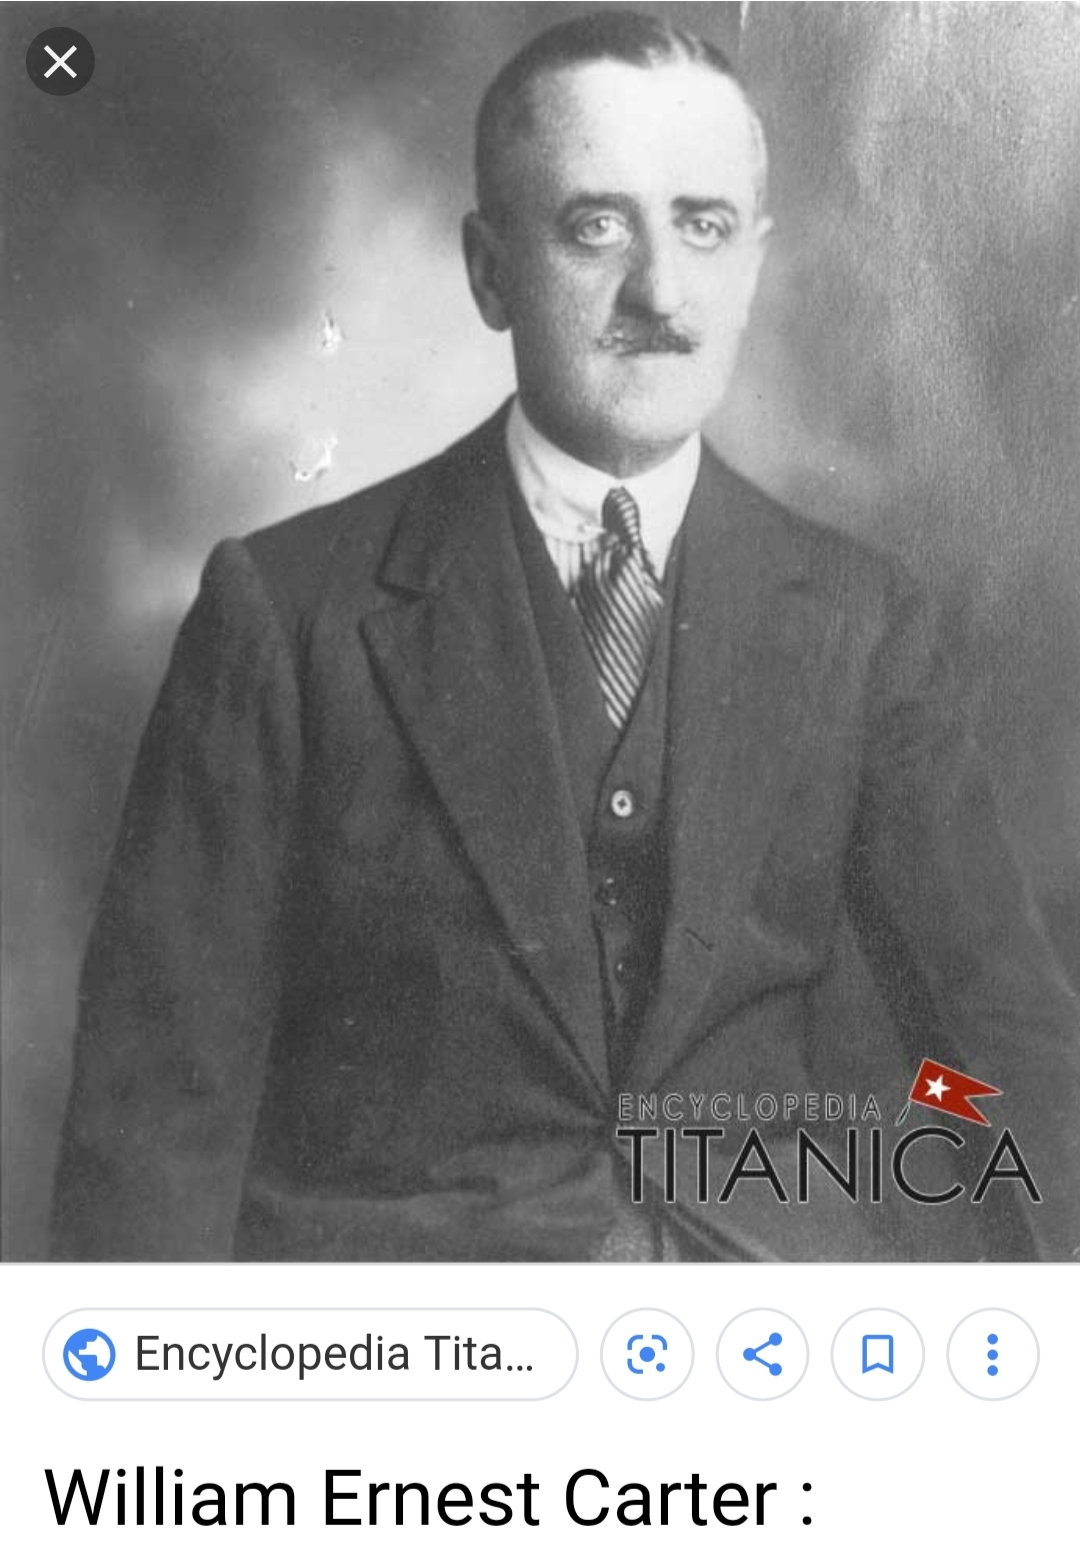 Courtesy of Encyclopedia Titanica